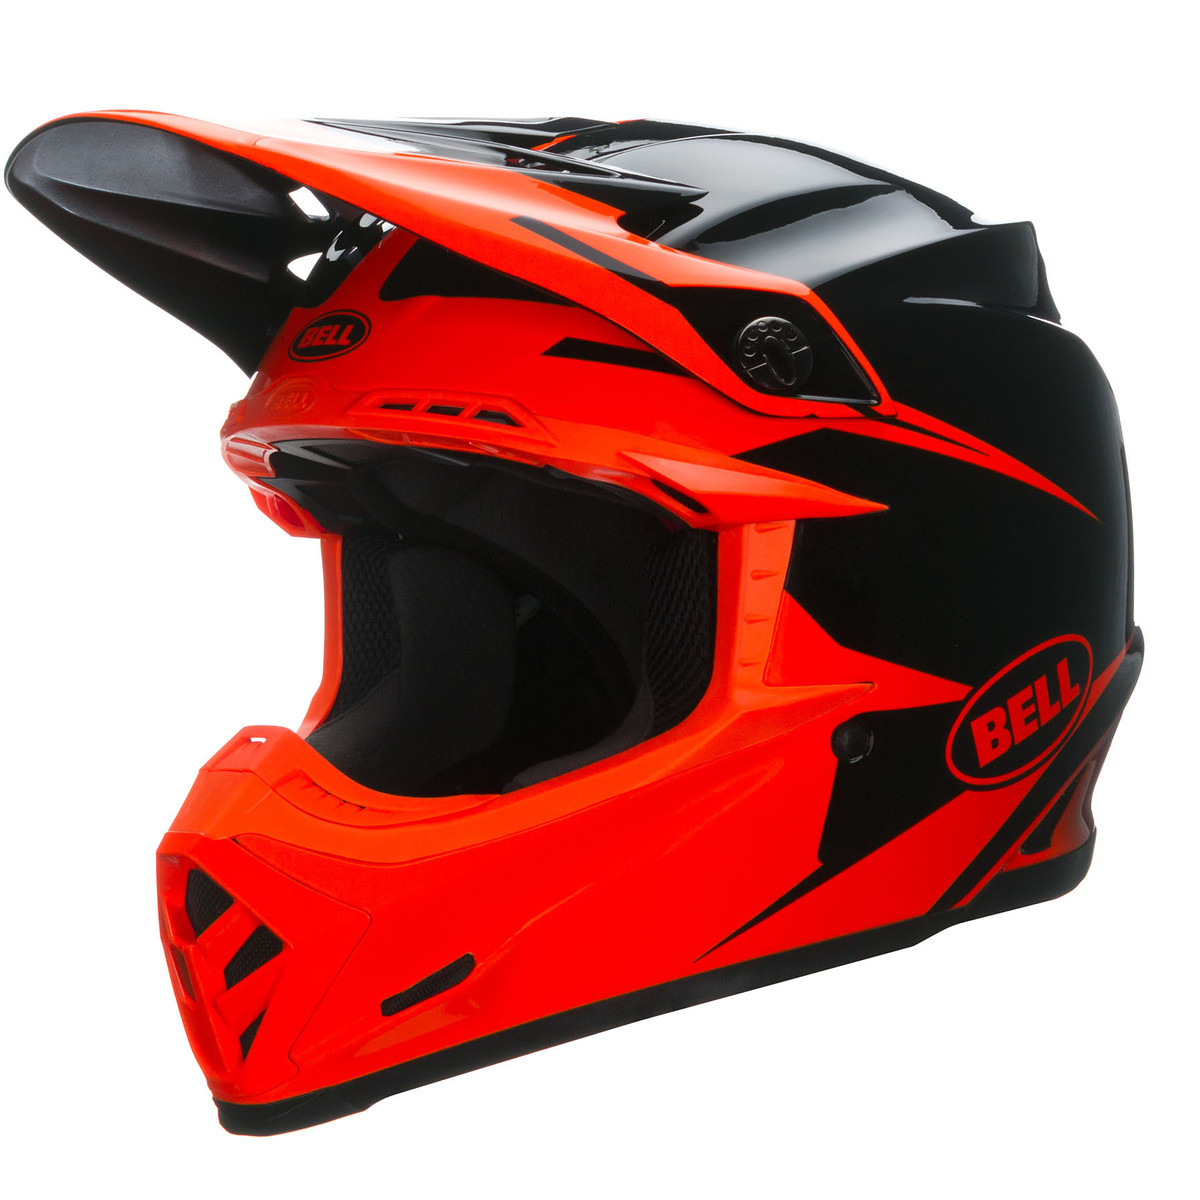 bell moto 9 199 moto related motocross forums message boards vital mx. Black Bedroom Furniture Sets. Home Design Ideas